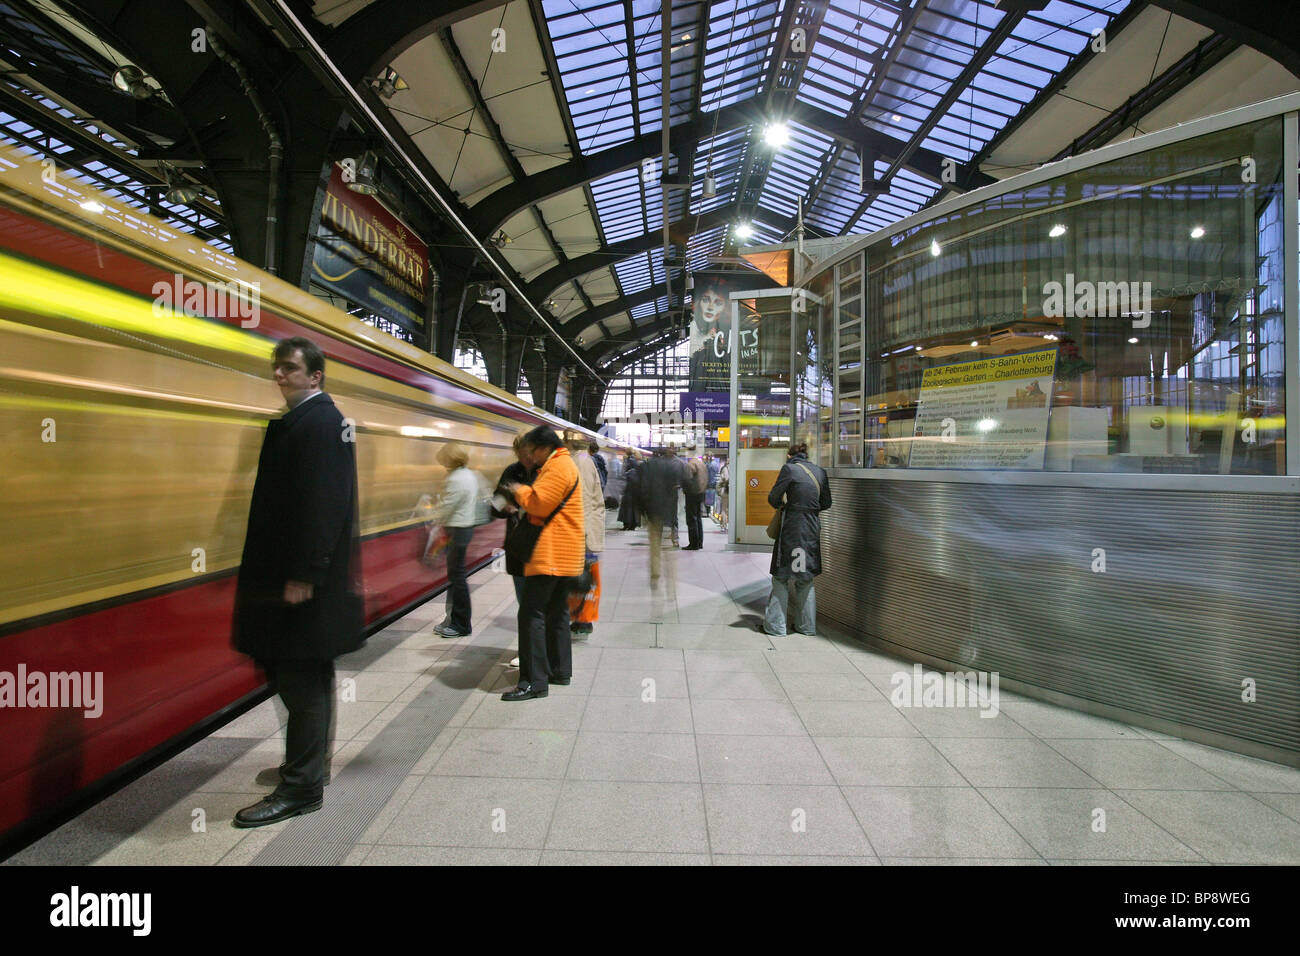 S-Bahn train in Friedrichstrasse station, Berlin Stock Photo